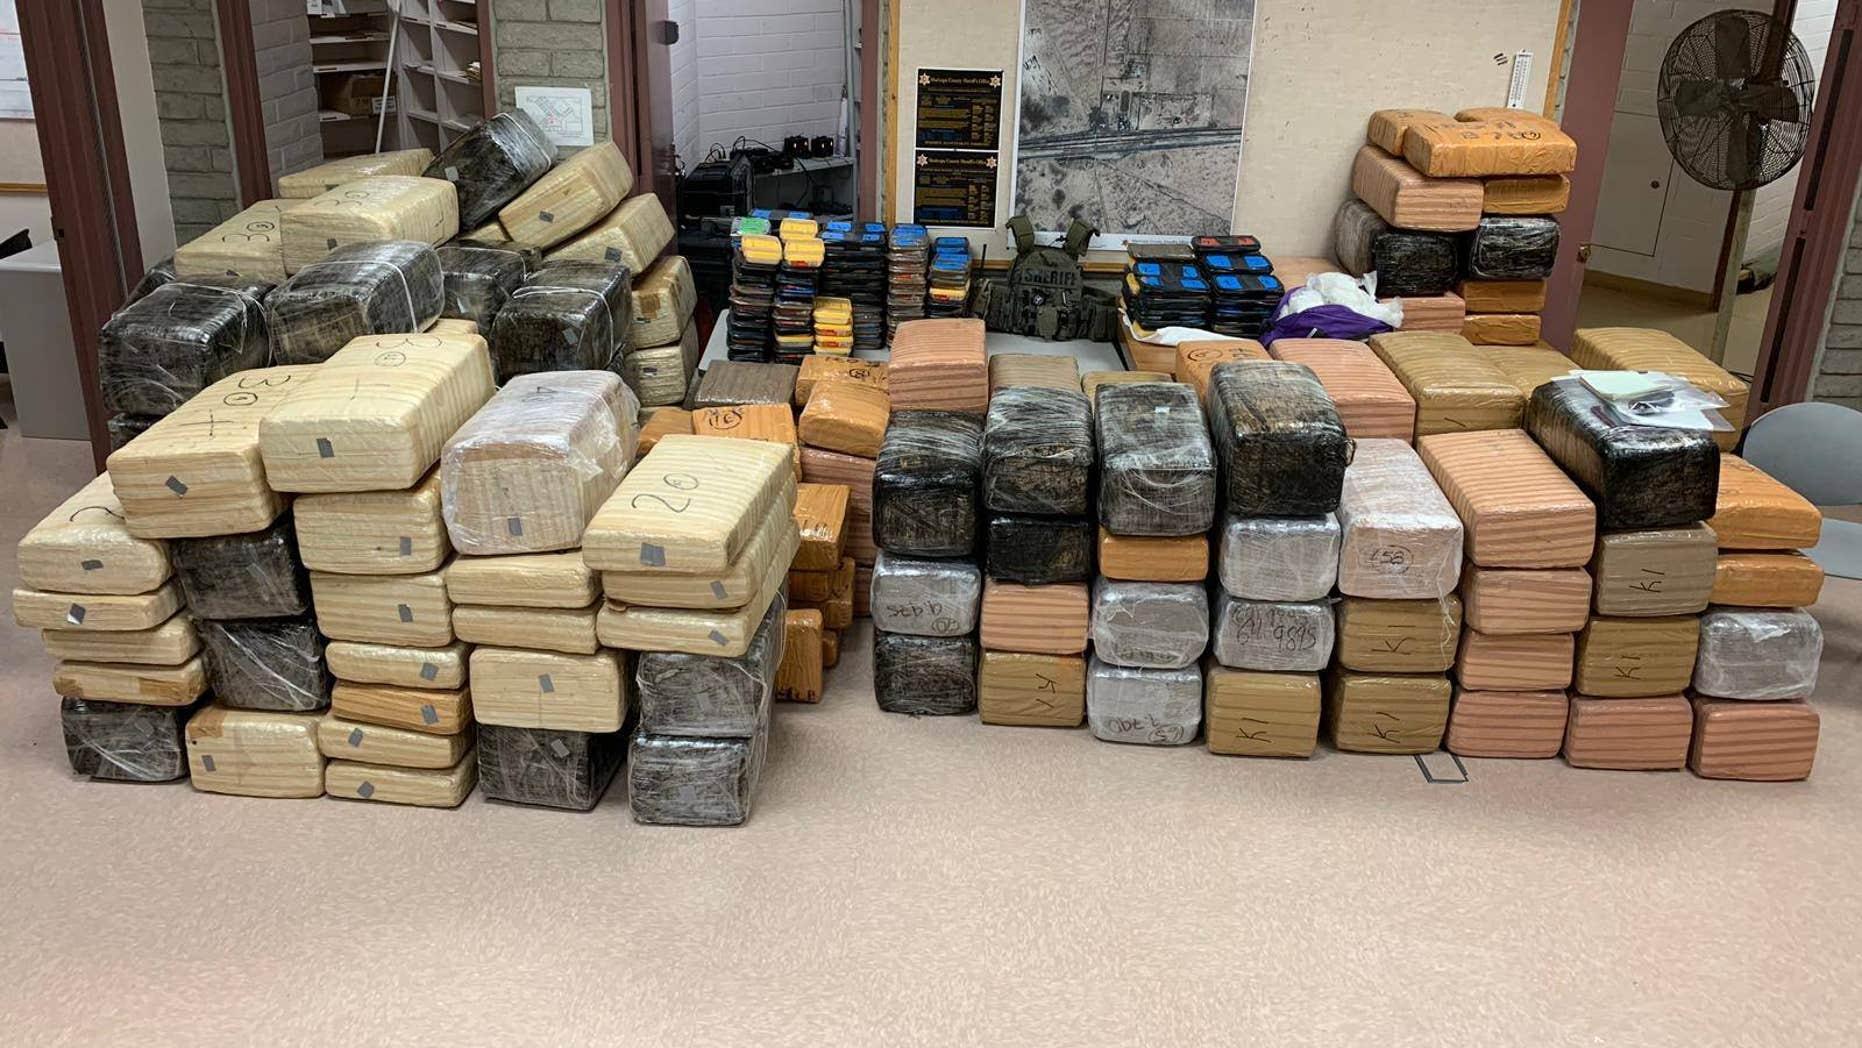 An estimated $2 million worth of methamphetamine and marijuana was seized in Arizona this week, officials said Friday.